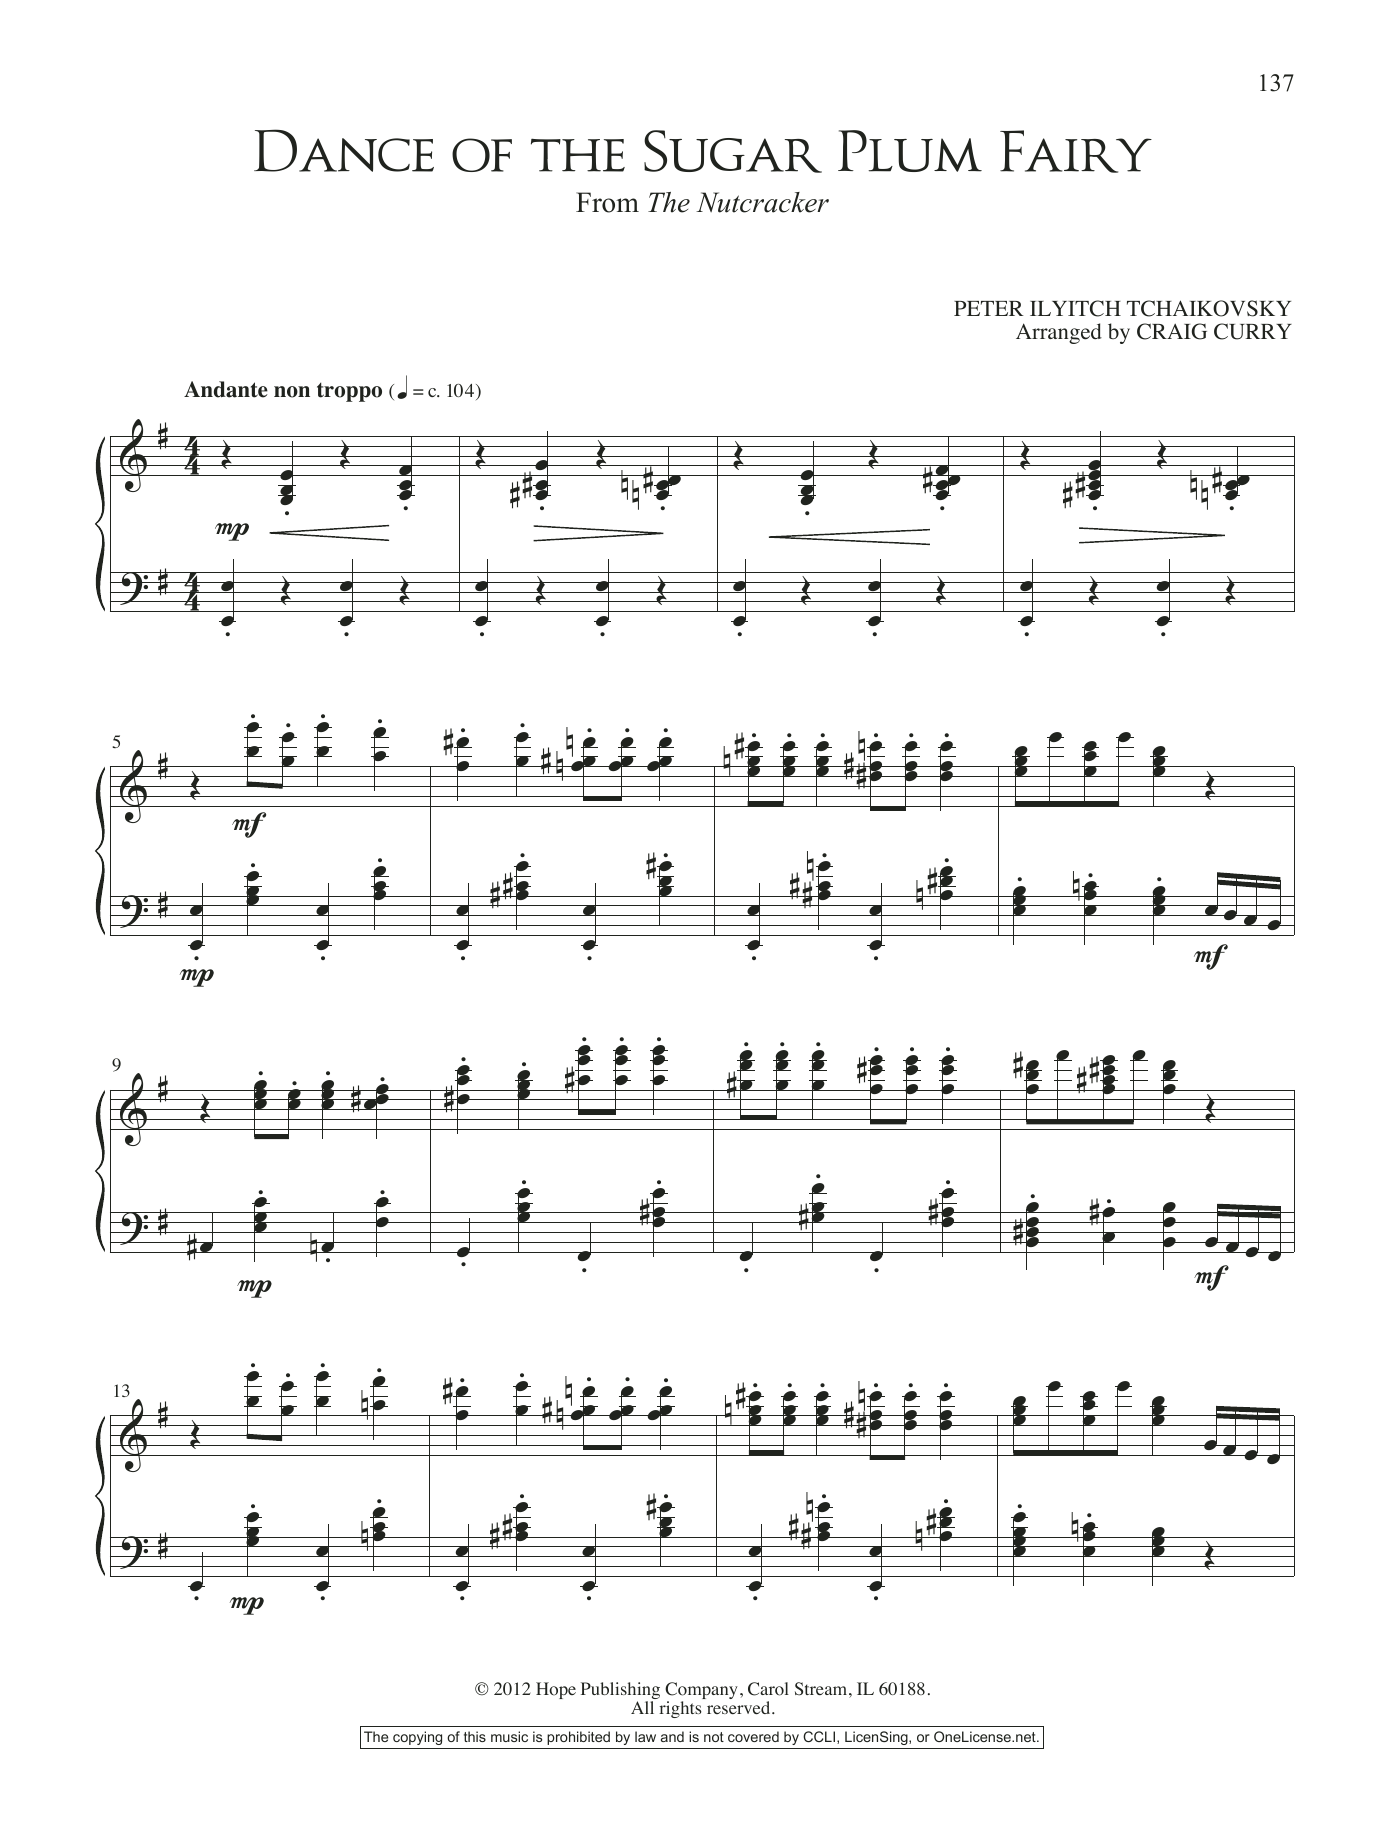 Pg 99 lyrics